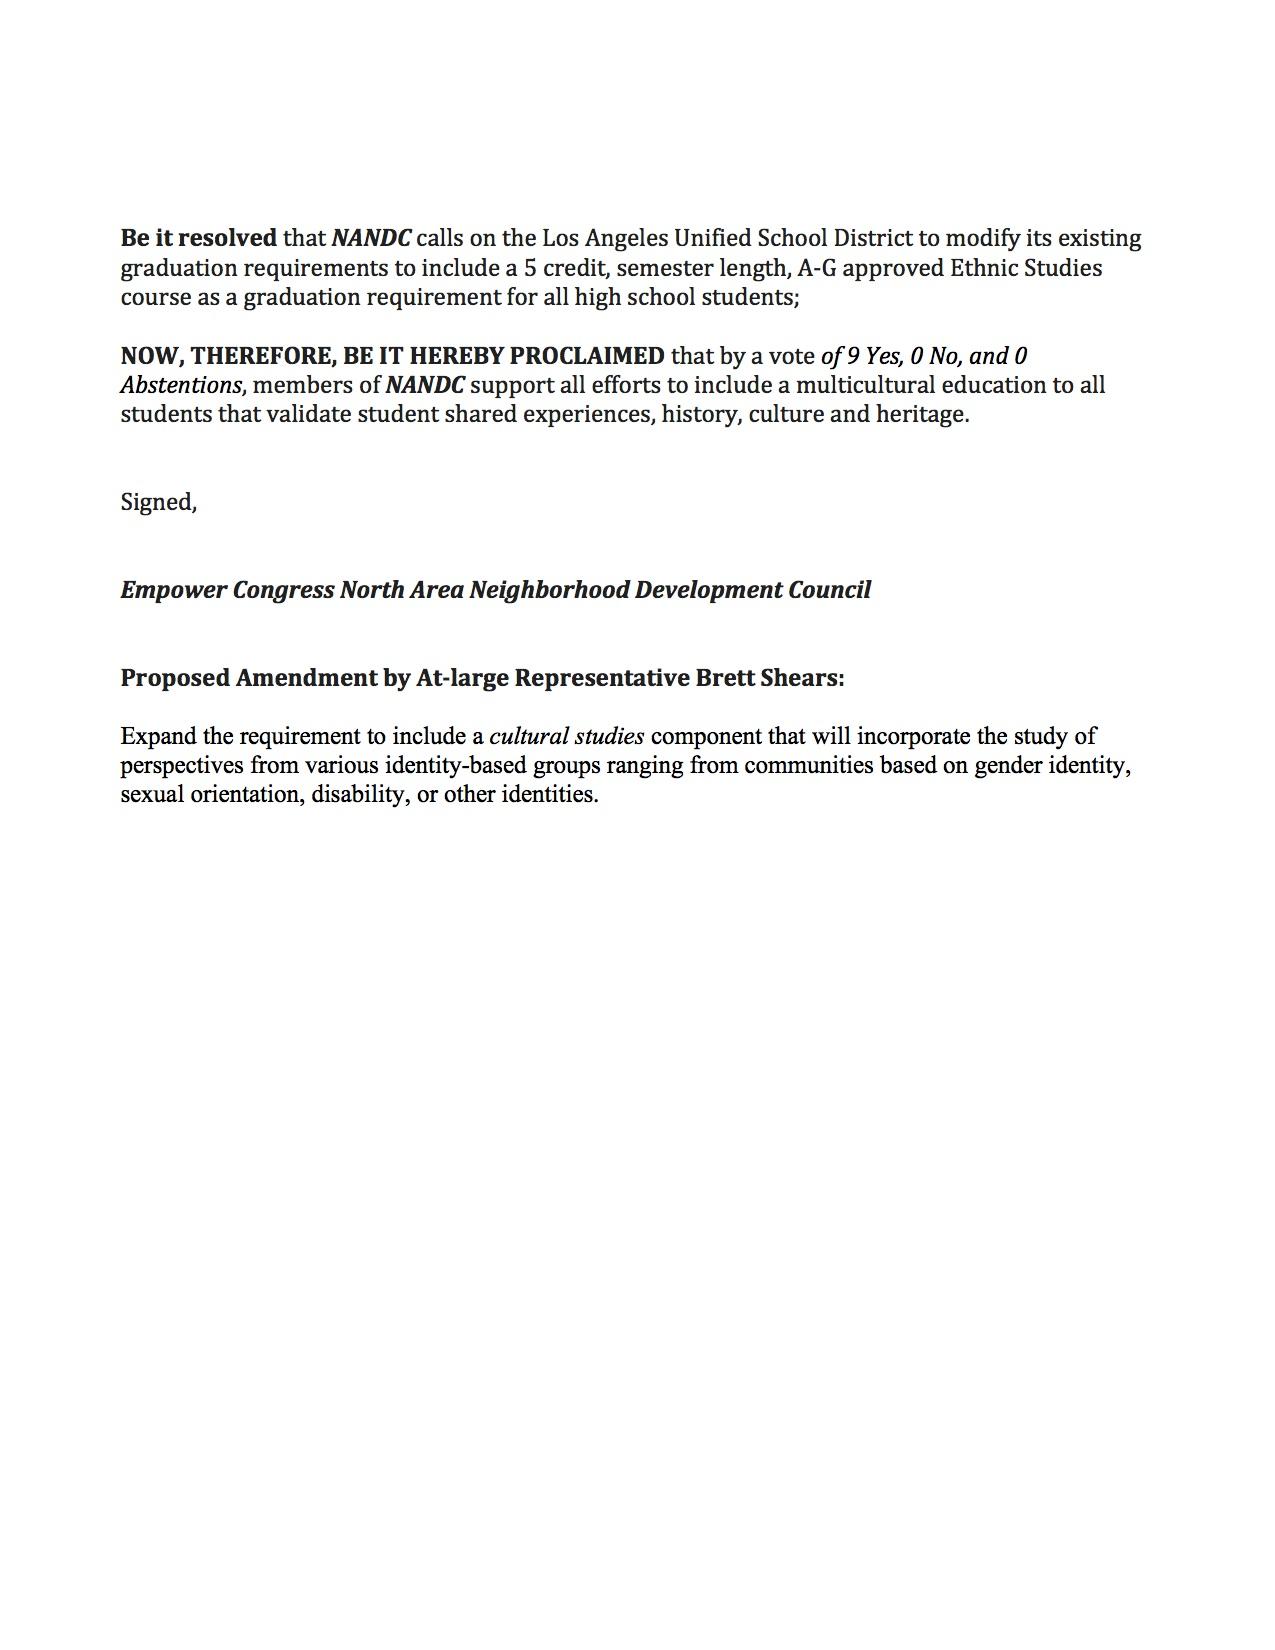 Empowerment_Congress_North_Area_p2.jpg